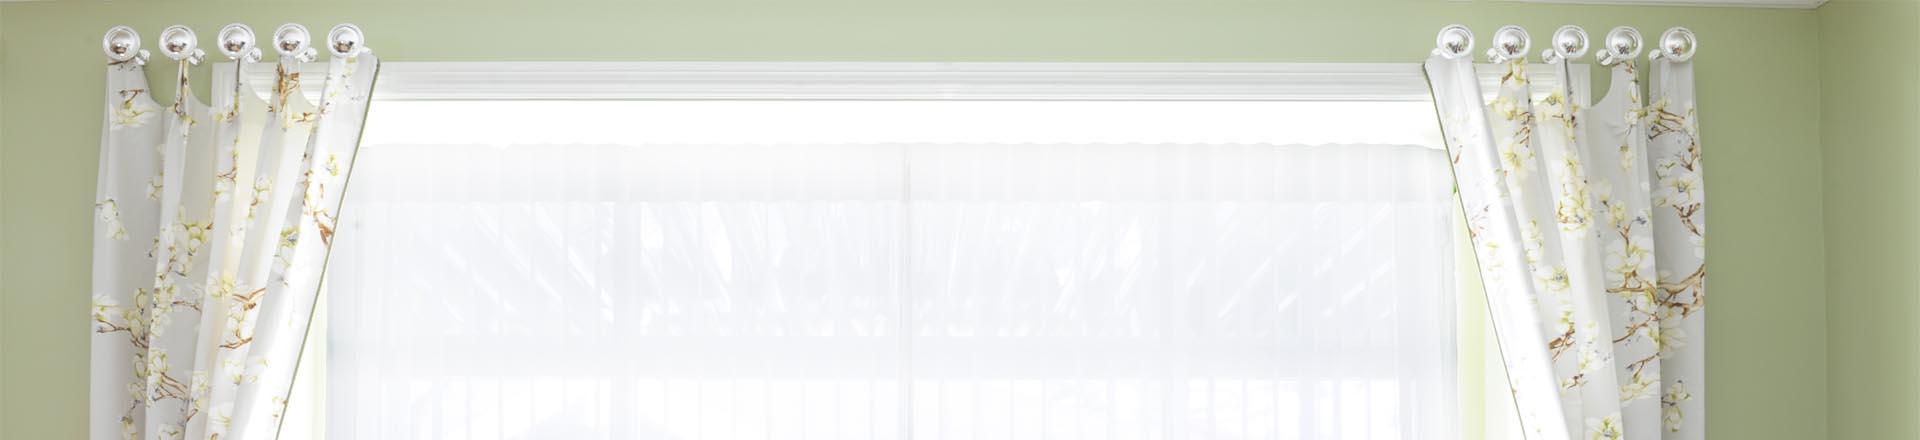 Custom Drapes and Window Treatments